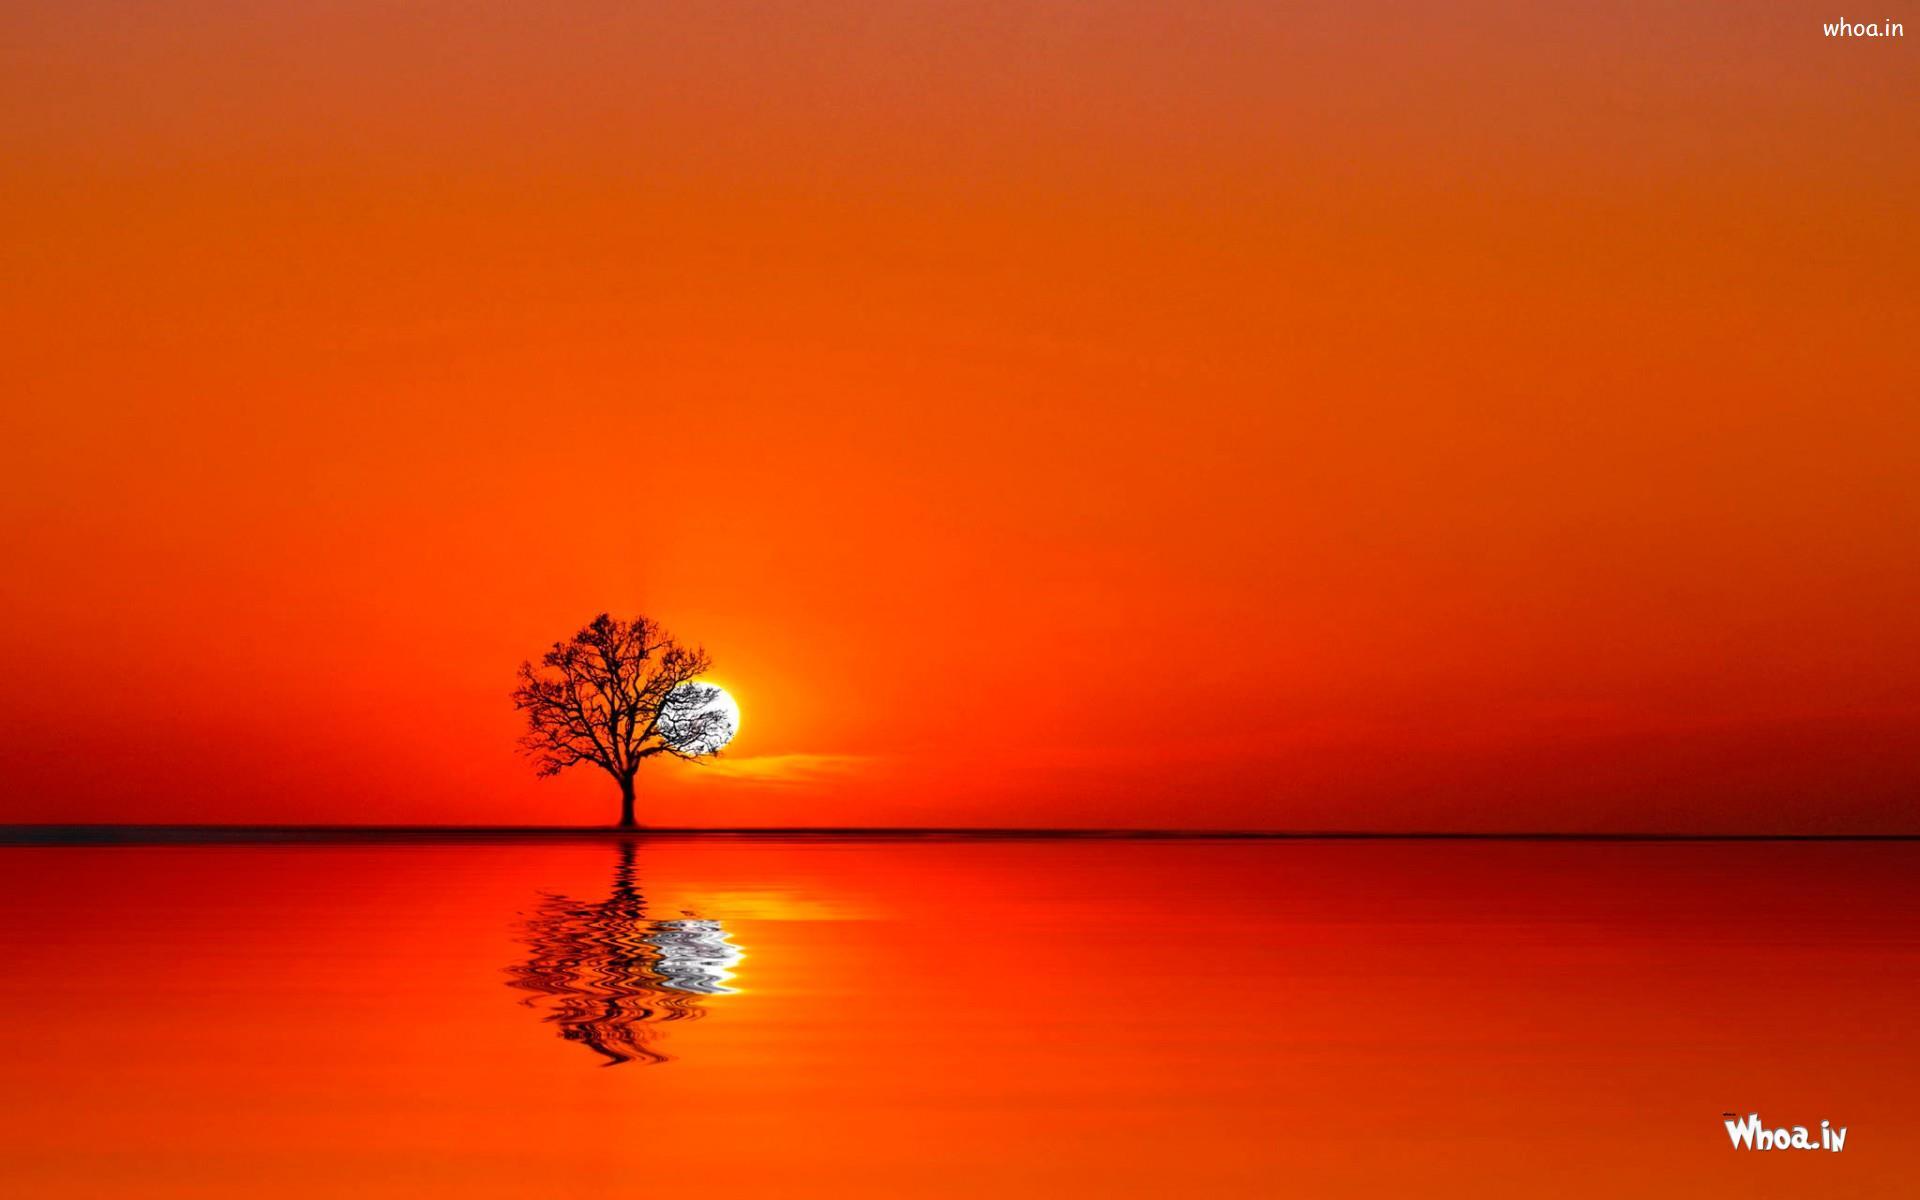 beautiful natural sunrise with orange background hd wallpaper